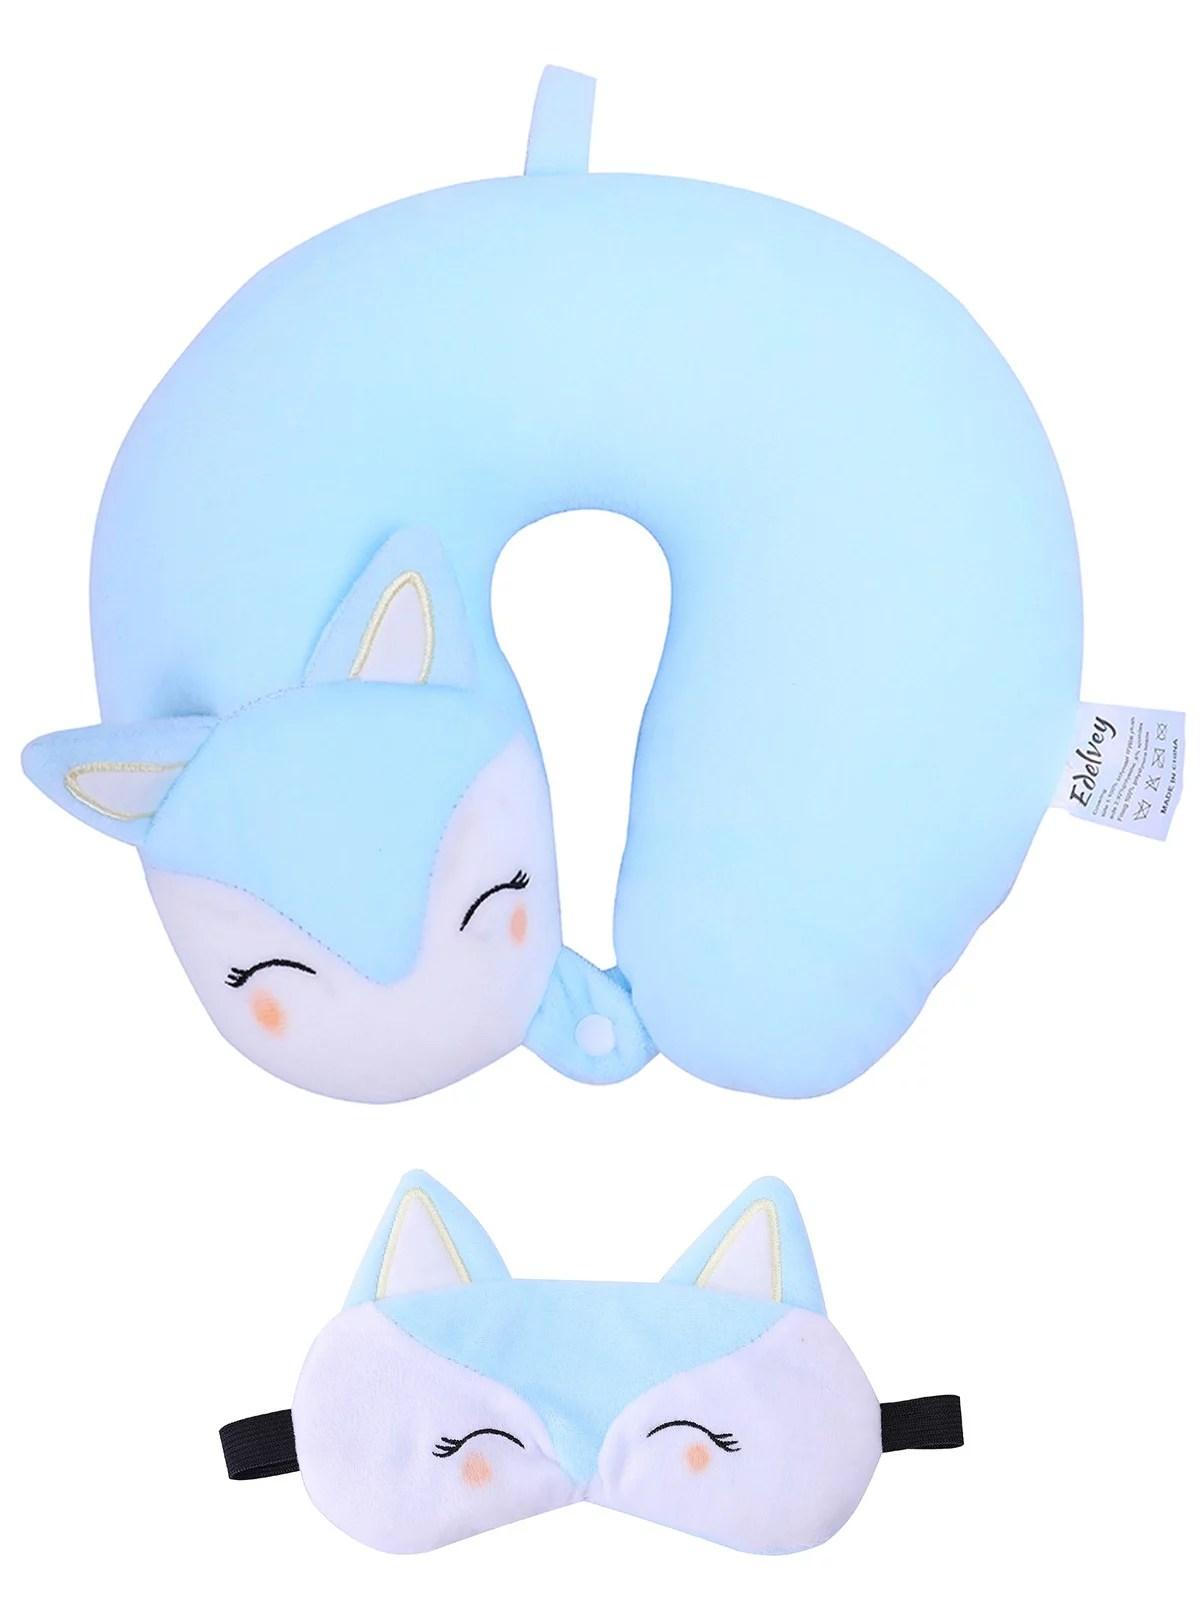 edelvey edelvey kids travel plush neck pillow with mask for girls cat walmart com